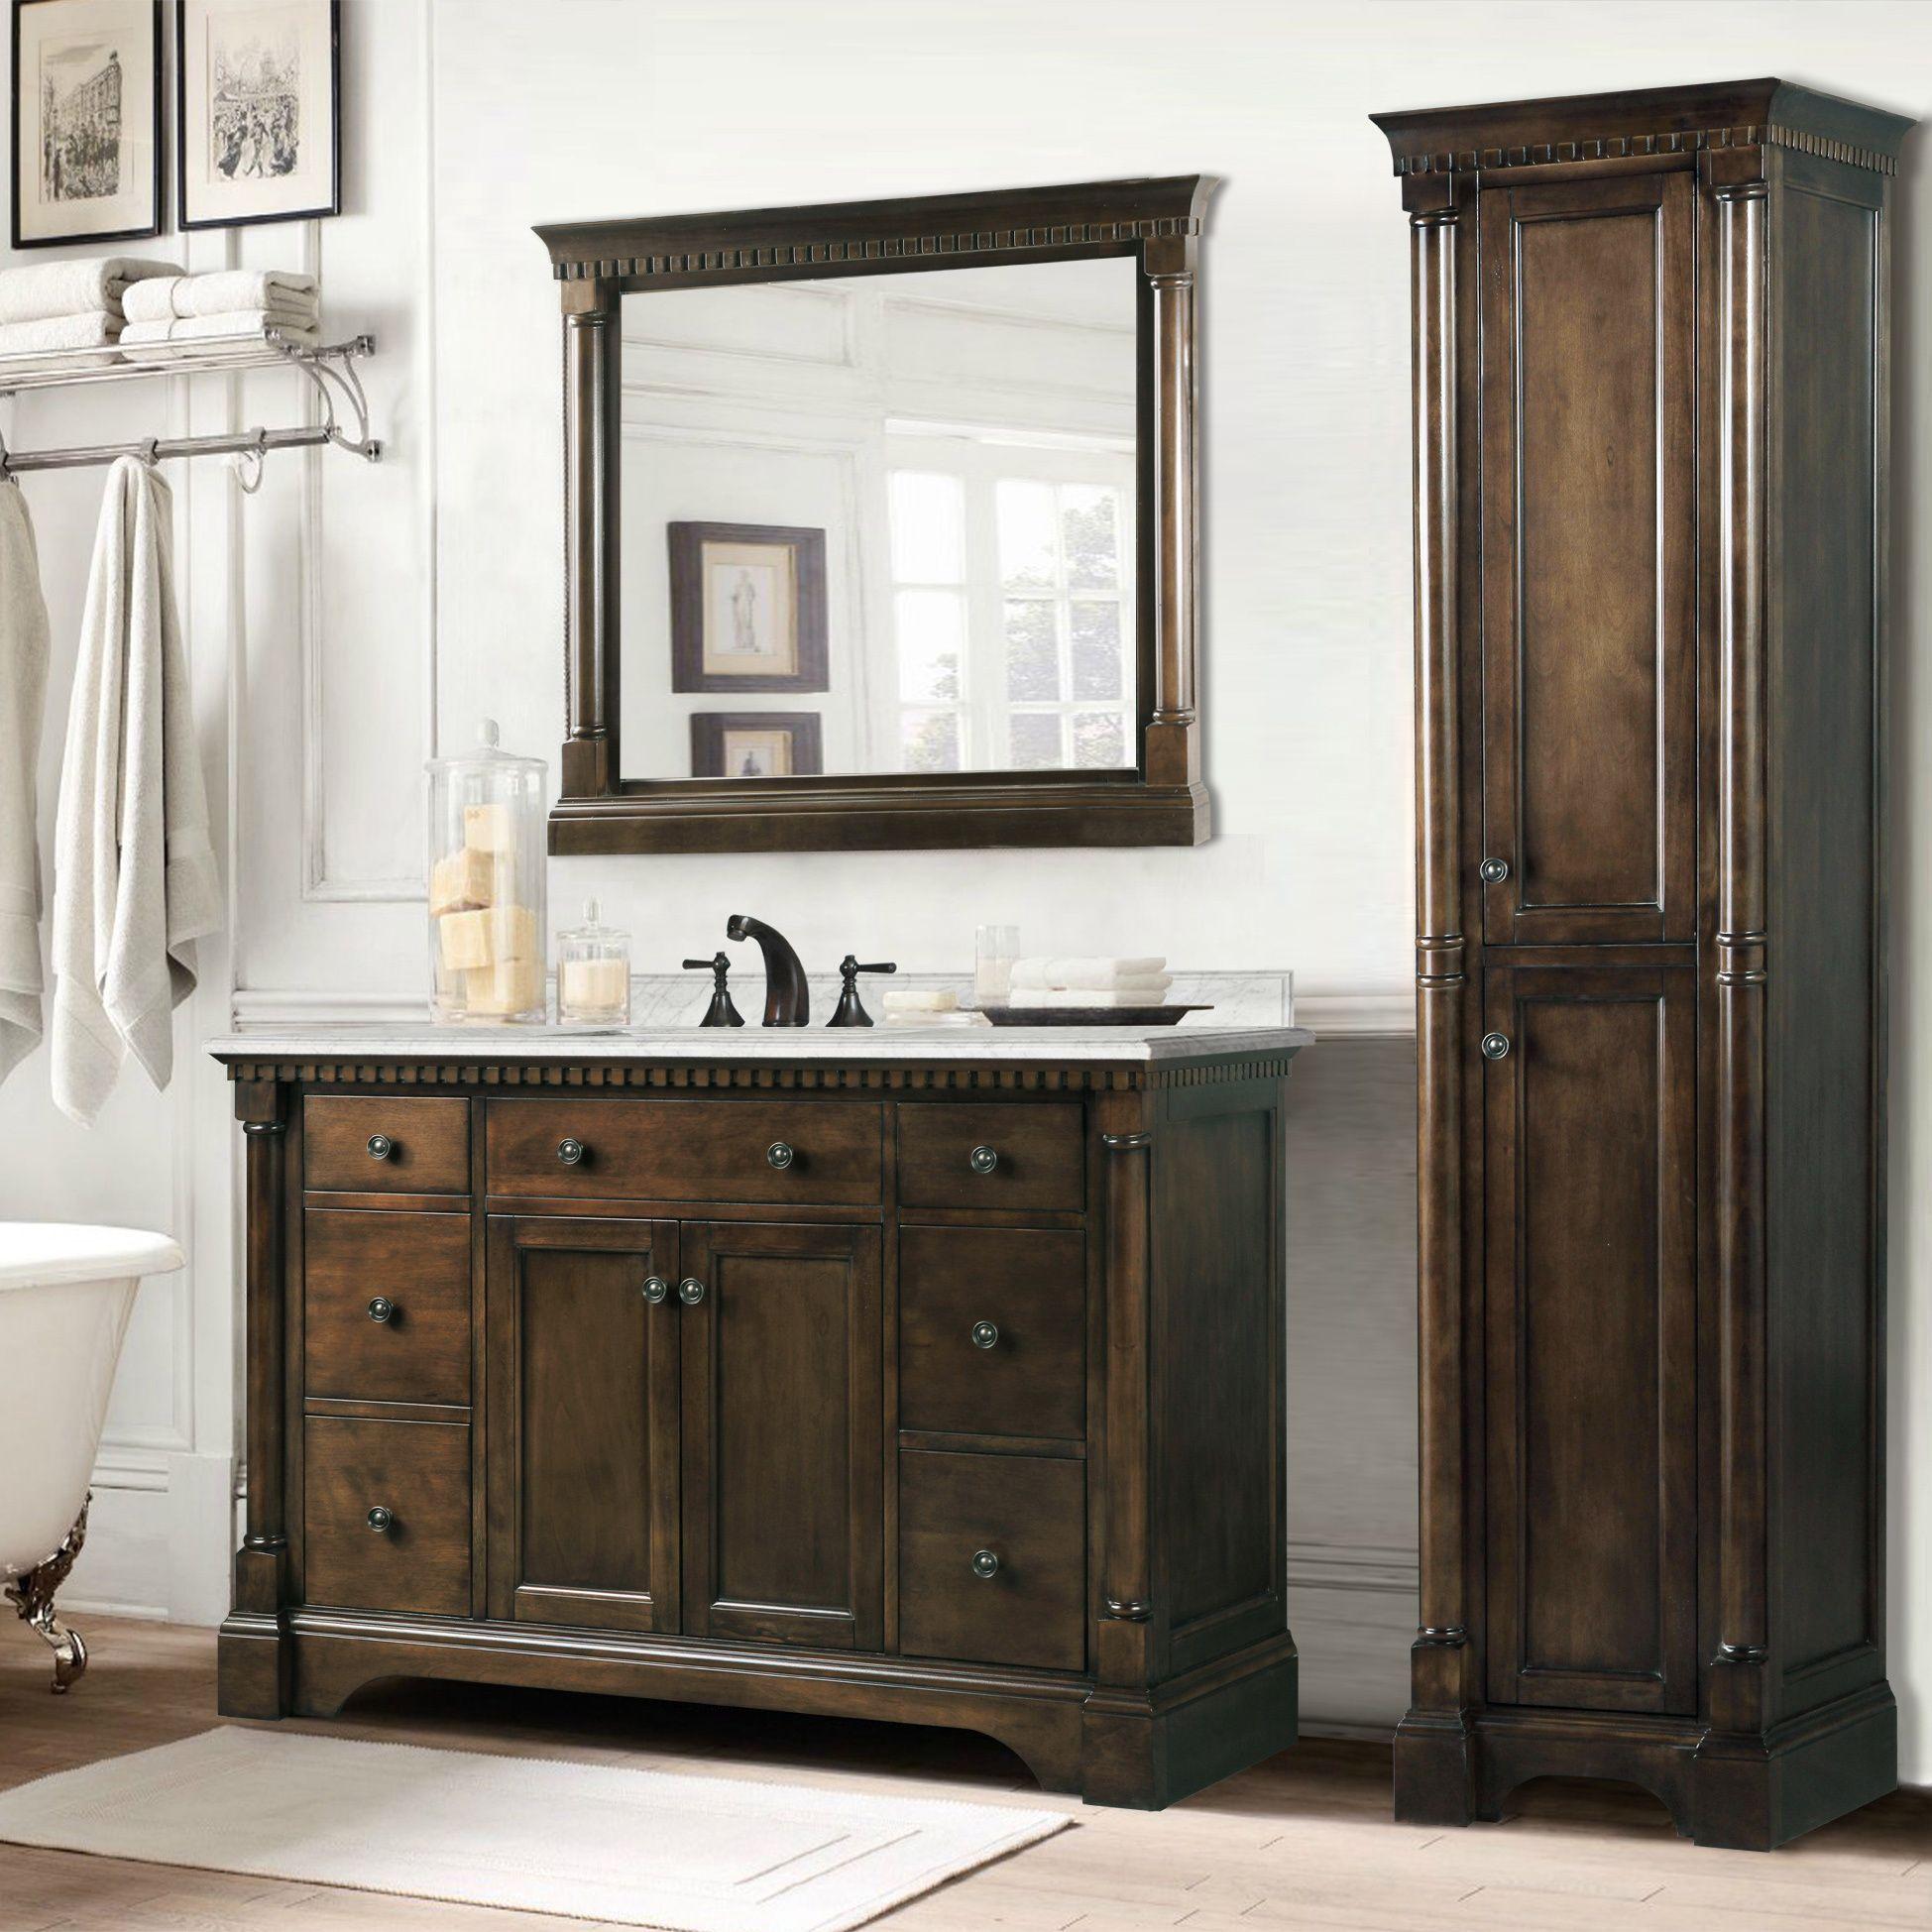 Legion furniture carrara white marble top 36 inch bathroom vanity coffee bean 3 piece set